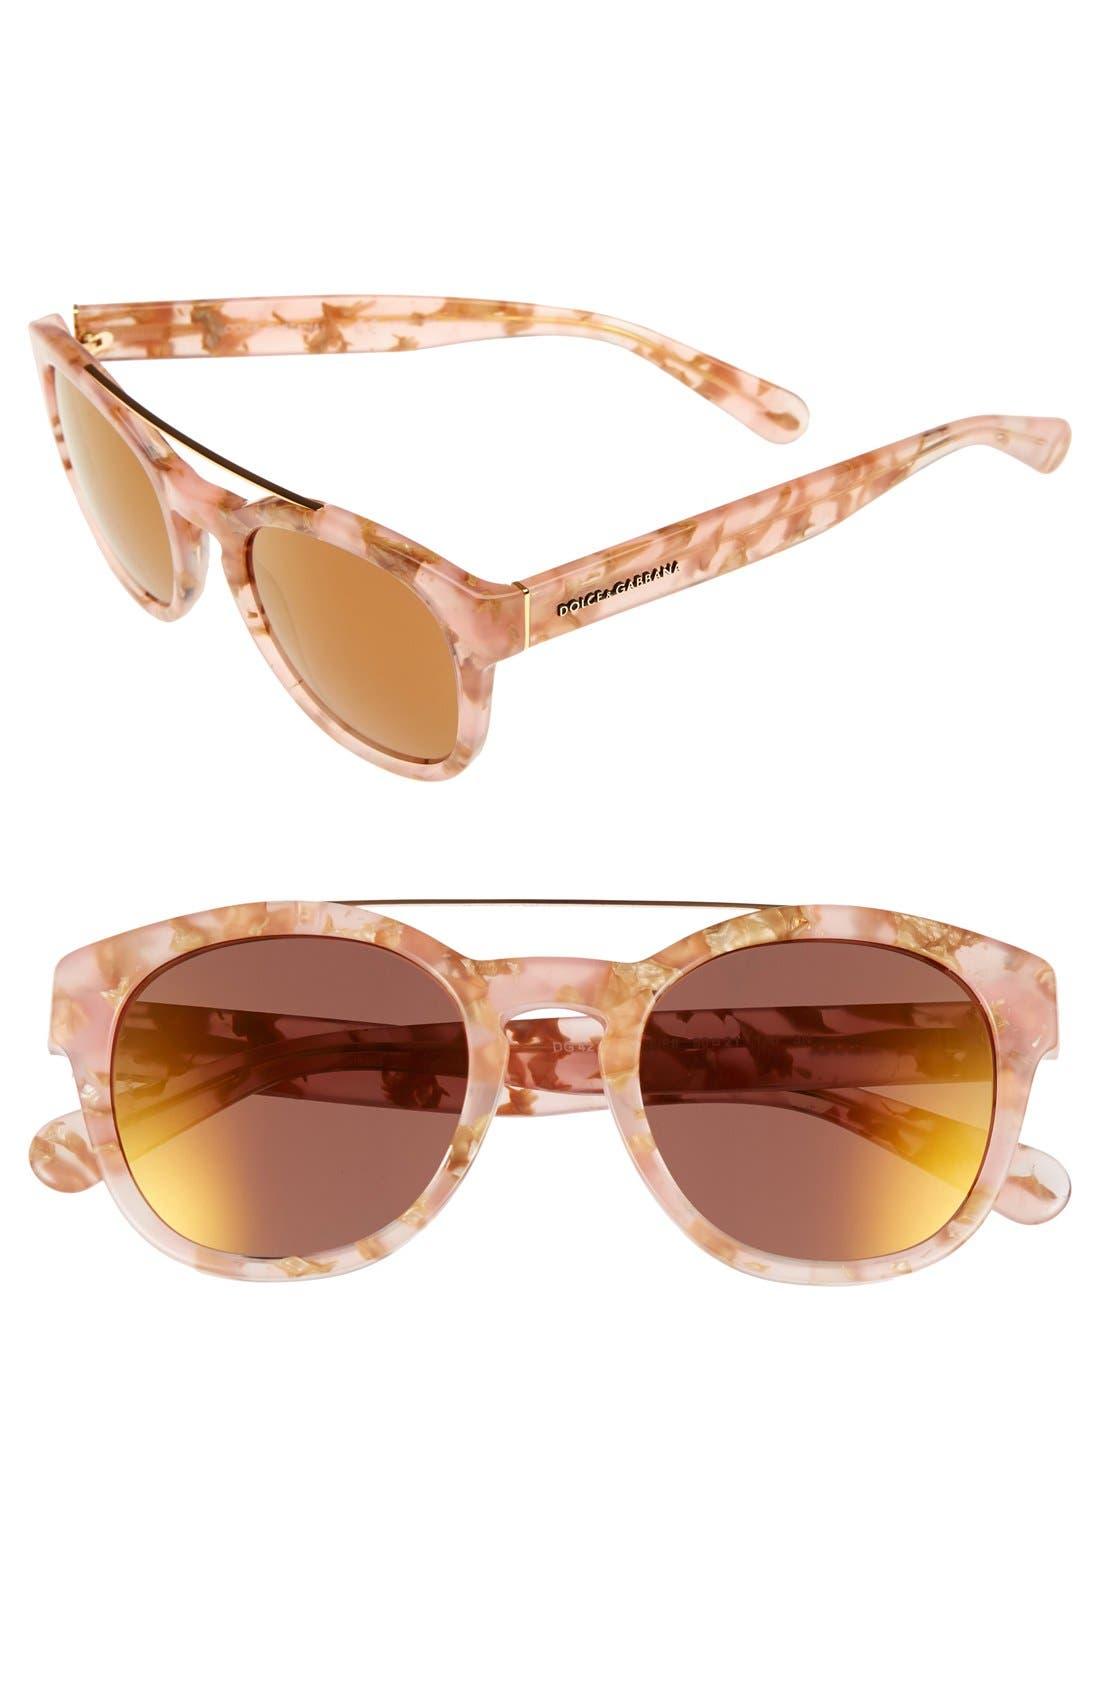 Main Image - Dolce&Gabbana 50mm Sunglasses